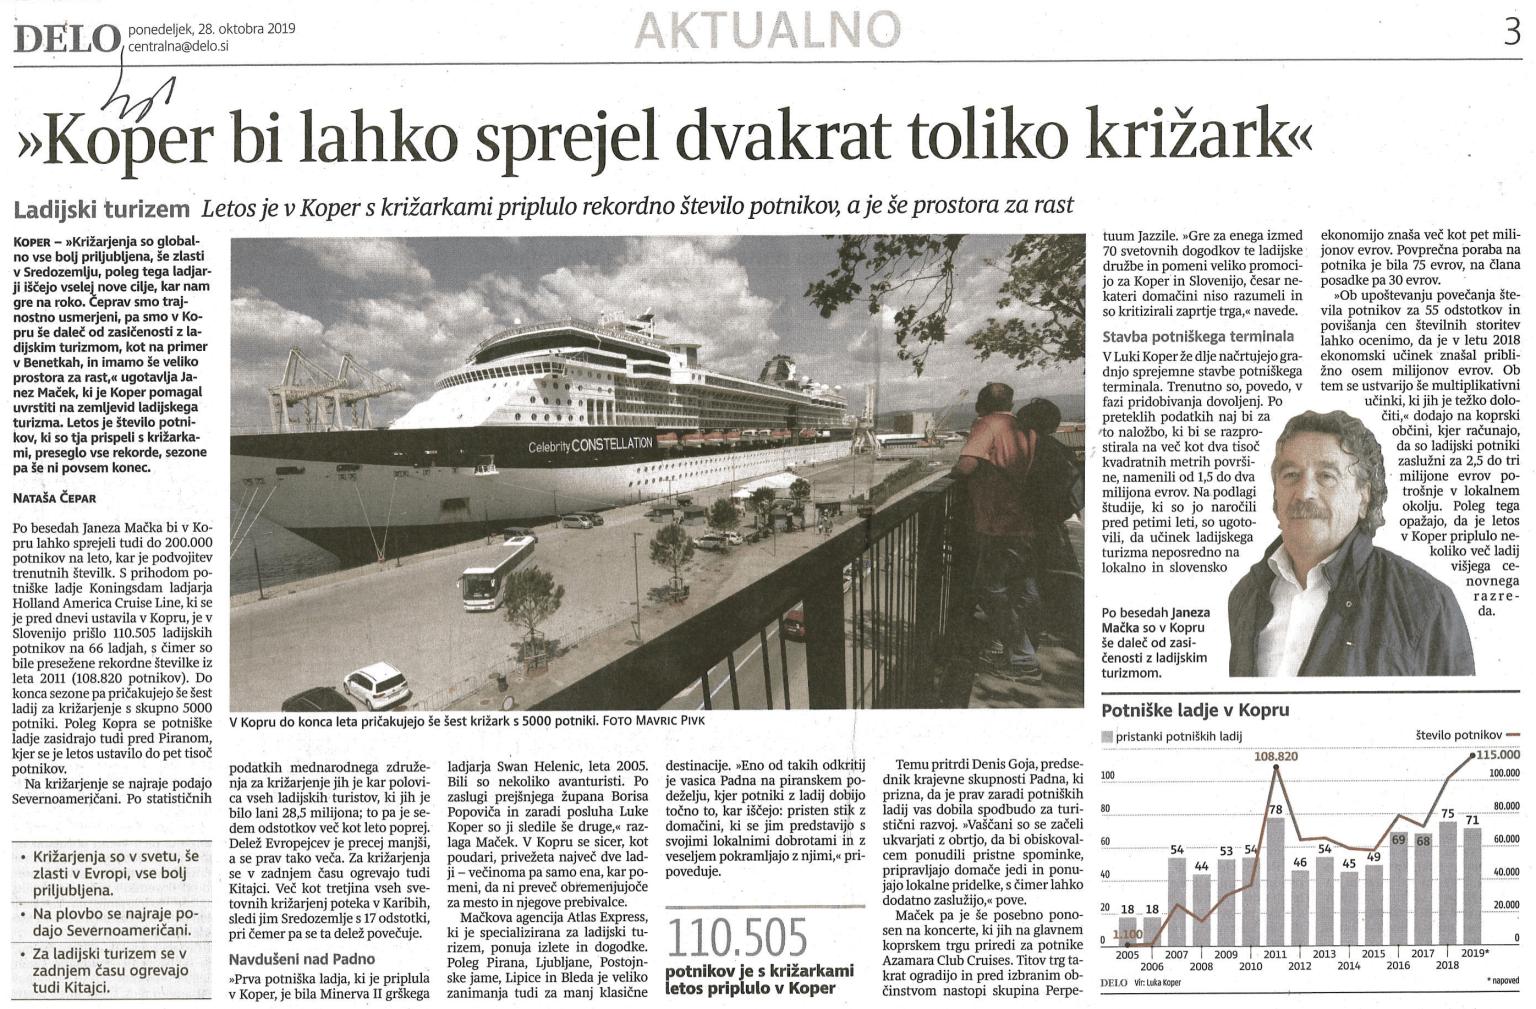 delo newspaper atlasexpress